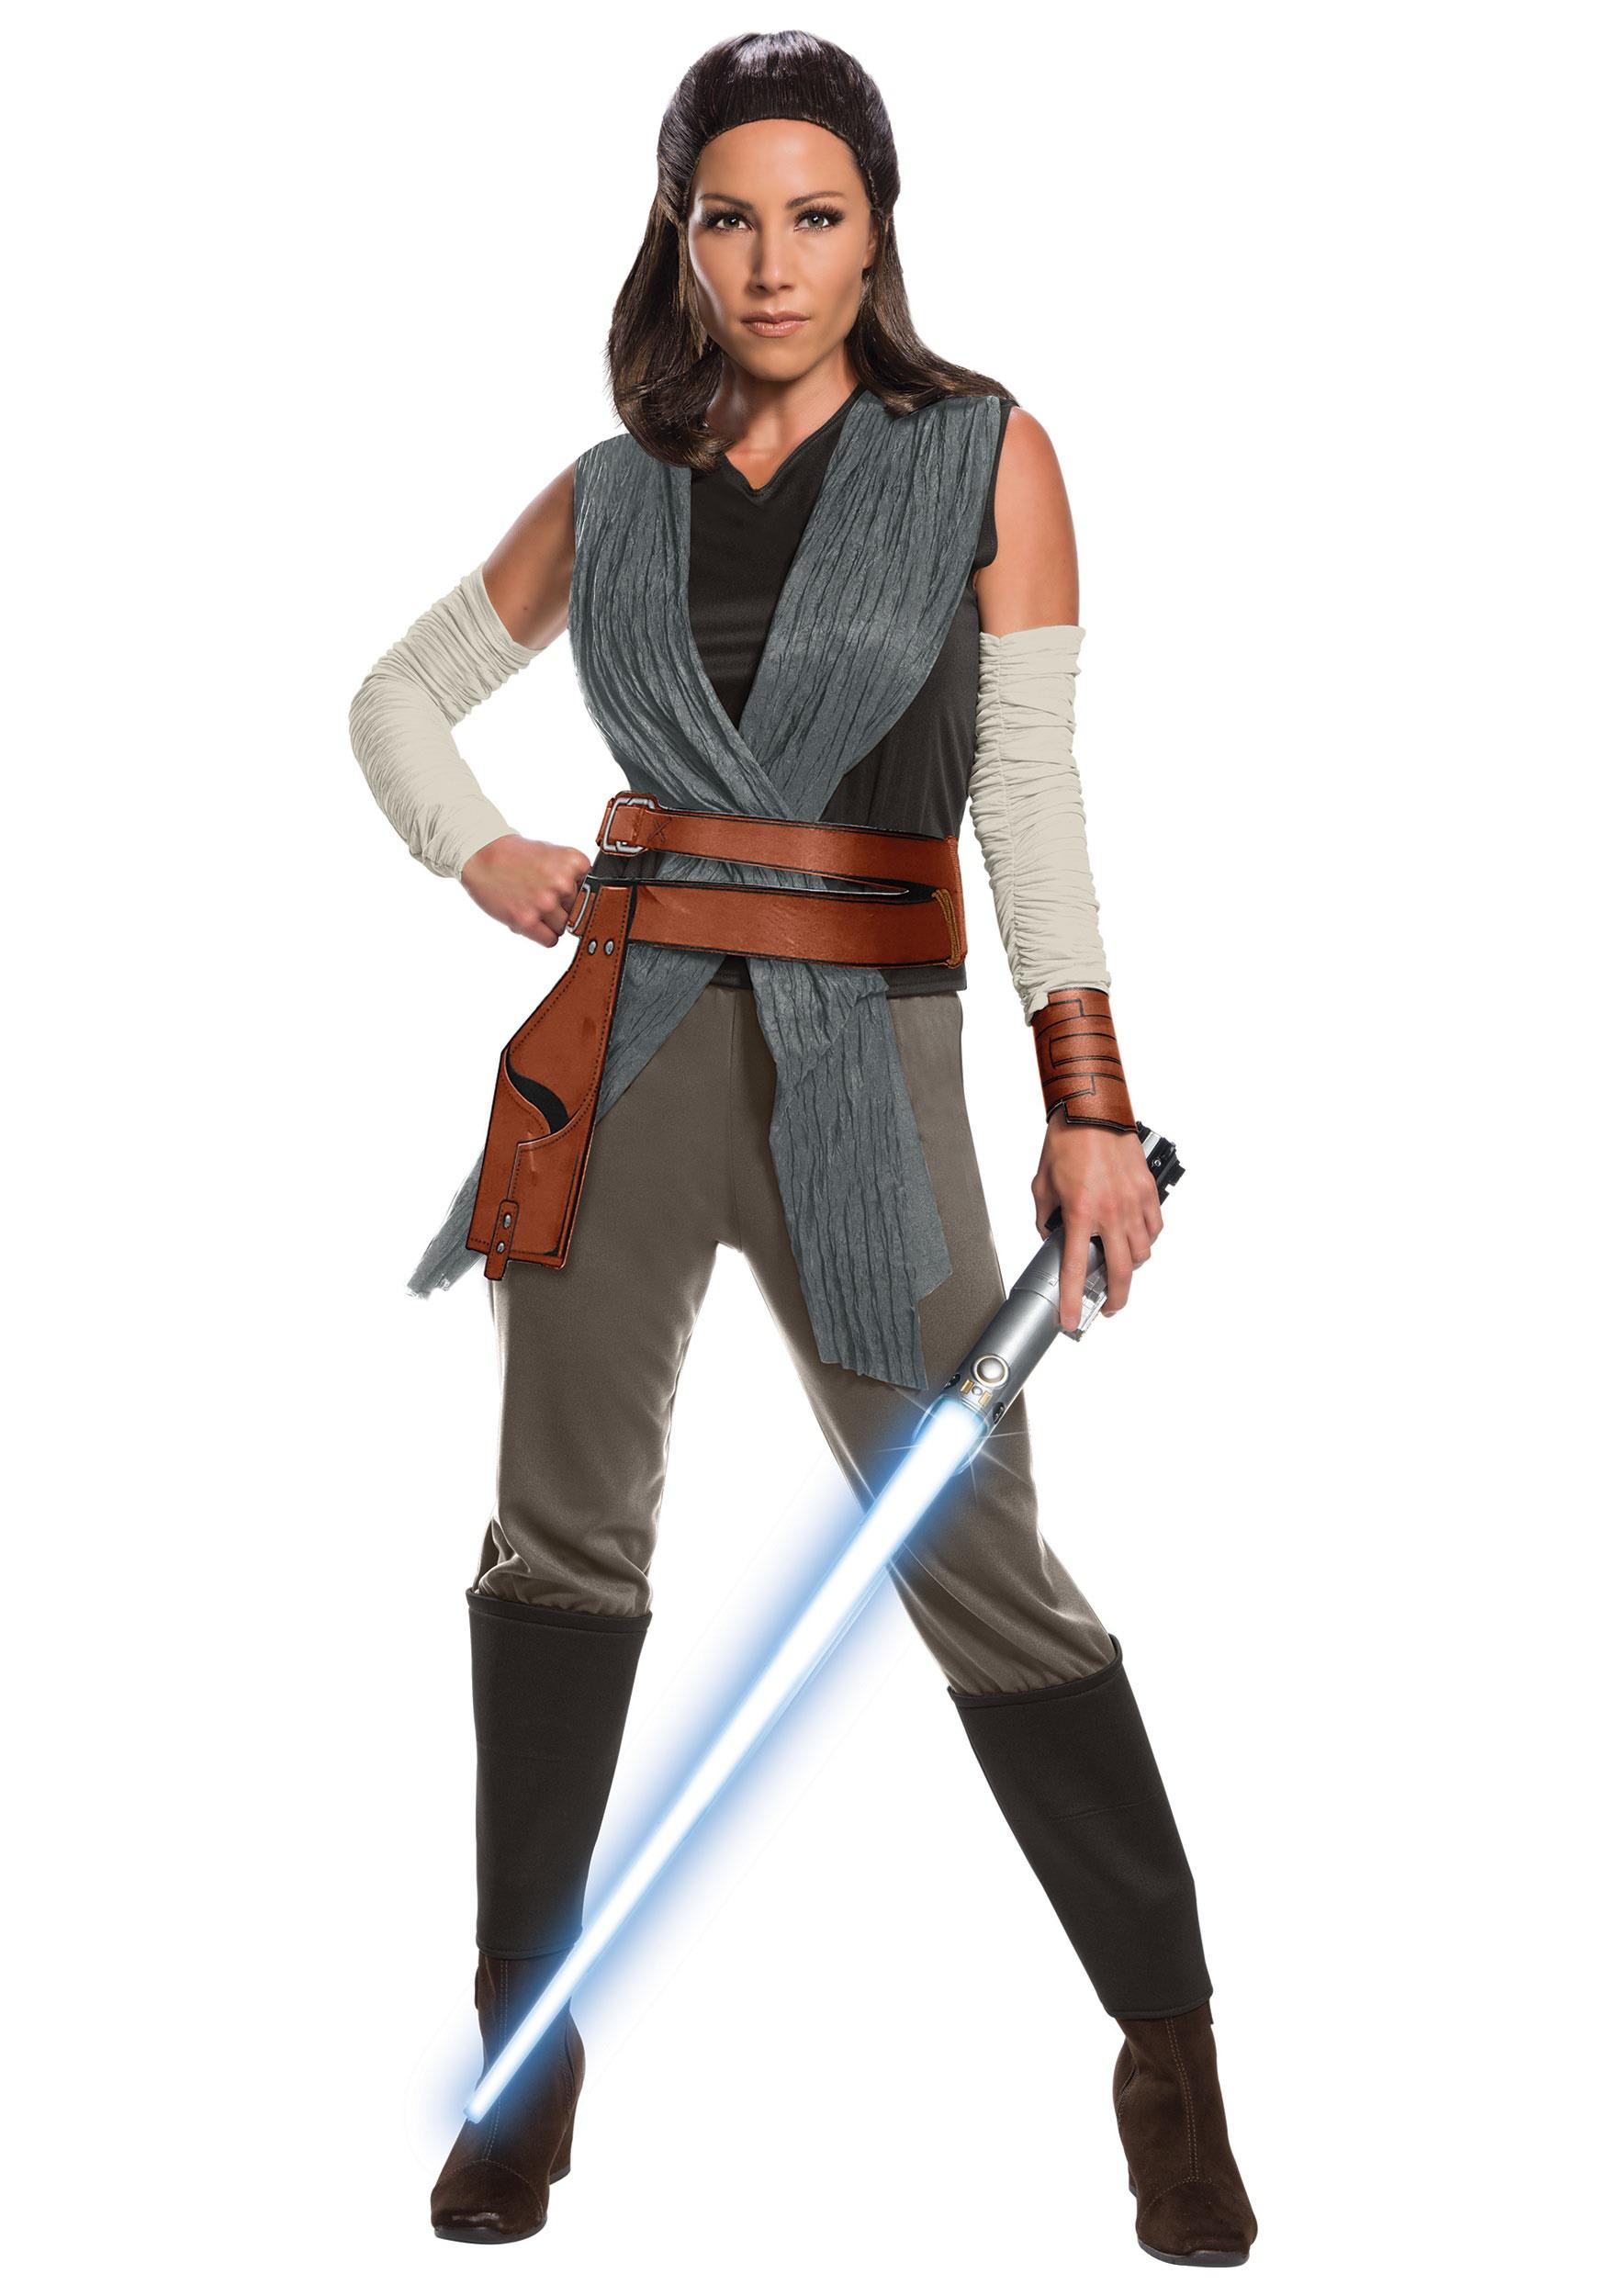 Disney Star Wars Rey Lightsaber Gun Episode VII Toy Prop Costume Accessory Blue